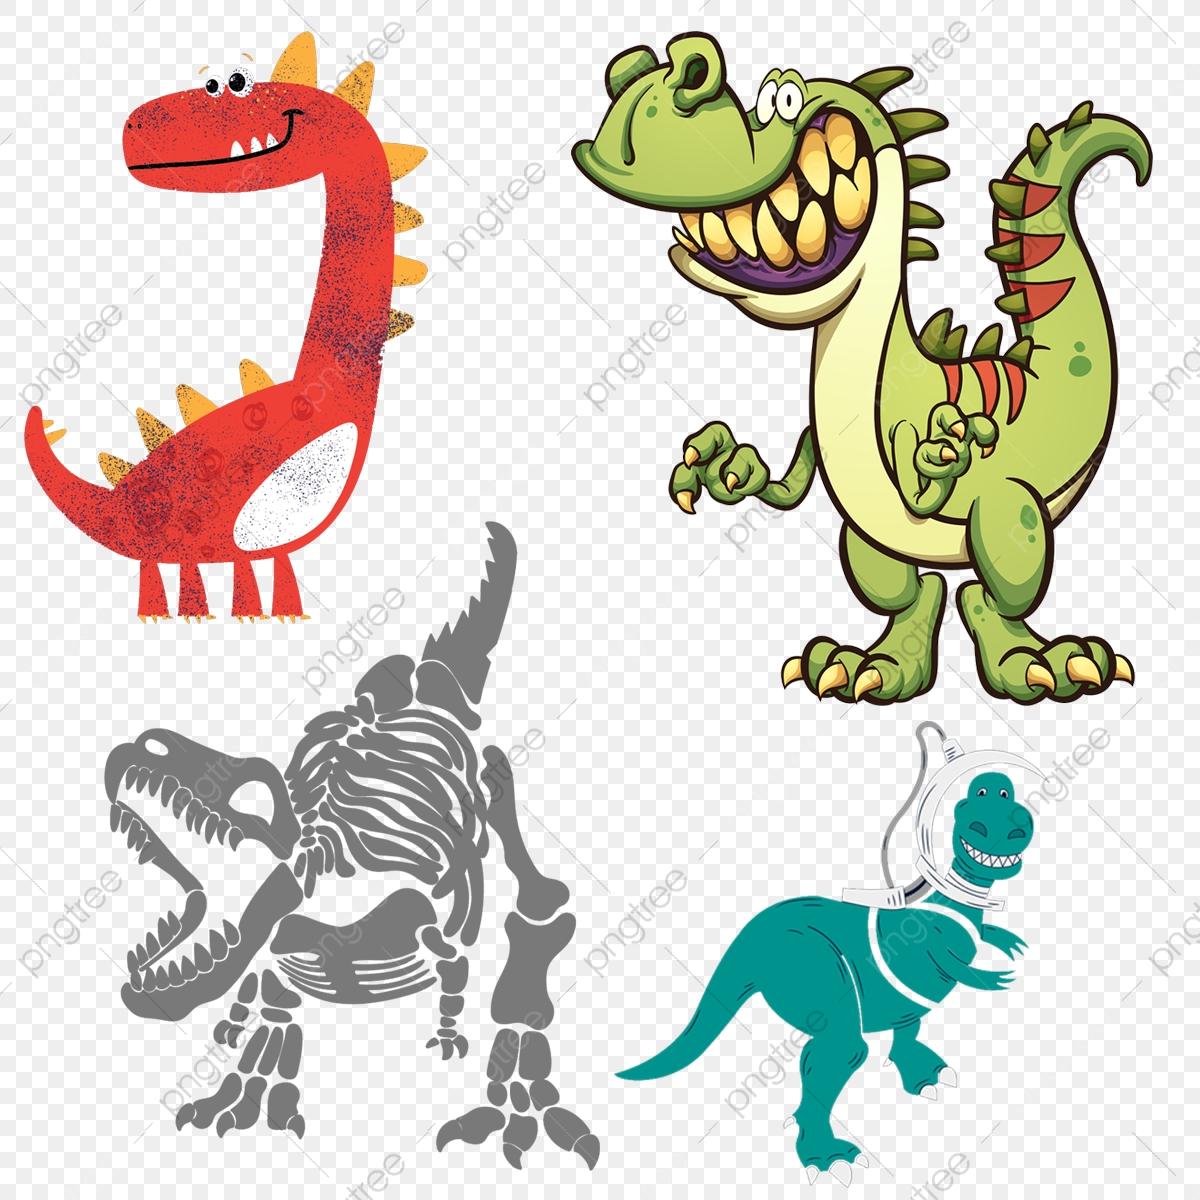 T Rex Vector, T Rex, T Rex Png PNG Transparent Clipart Image.